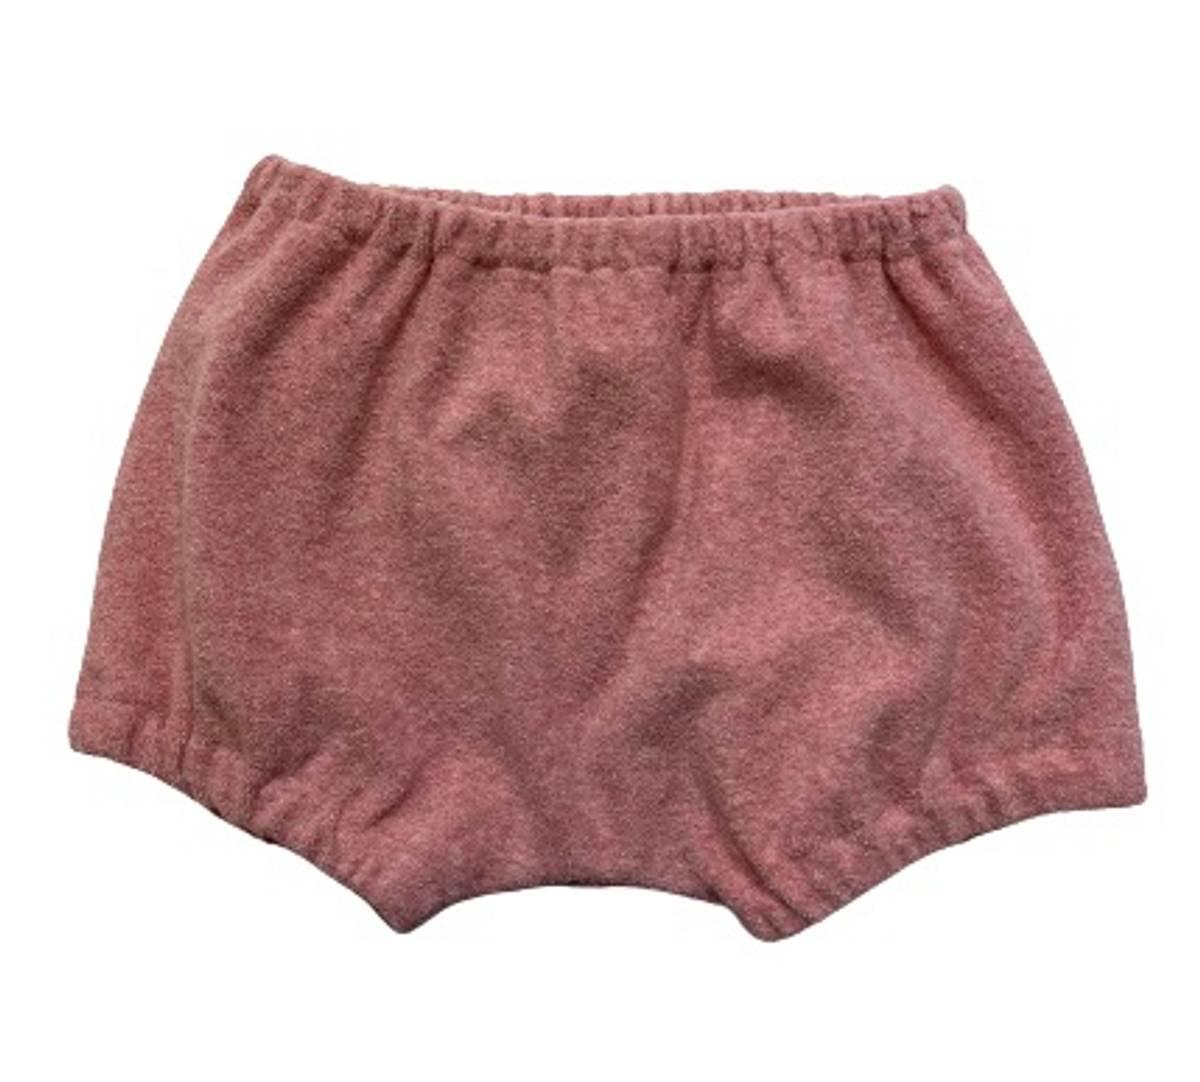 HUTTELiHUT Home frotte shorts - dark rose